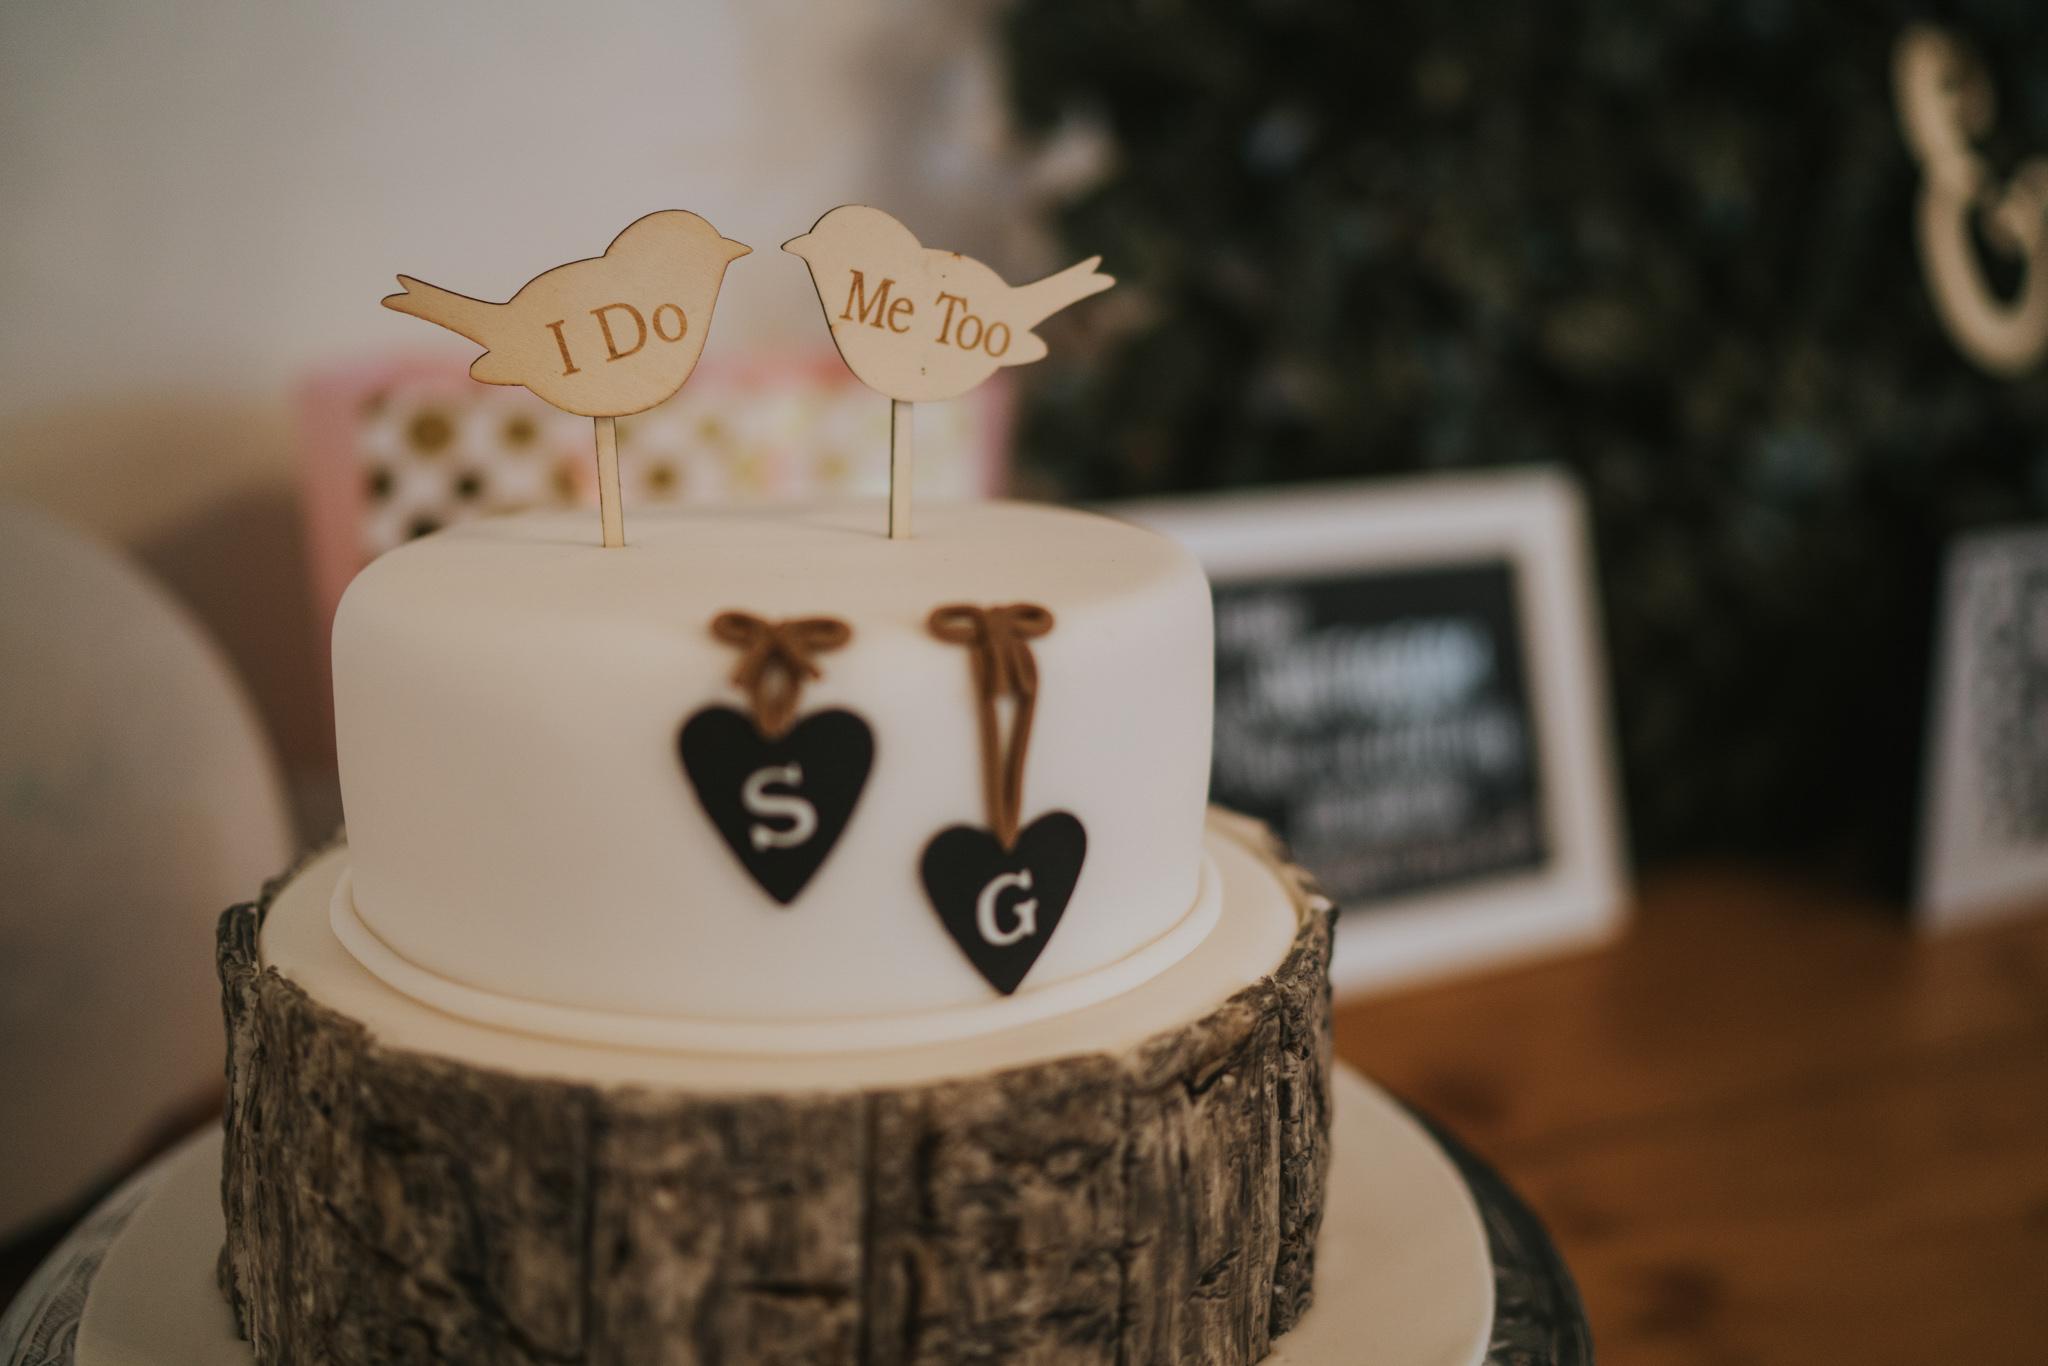 grace-sam-old-barn-clovelly-devon-wedding-photographer-grace-elizabeth-essex-suffolk-norfolk-wedding-photographer (81 of 132).jpg